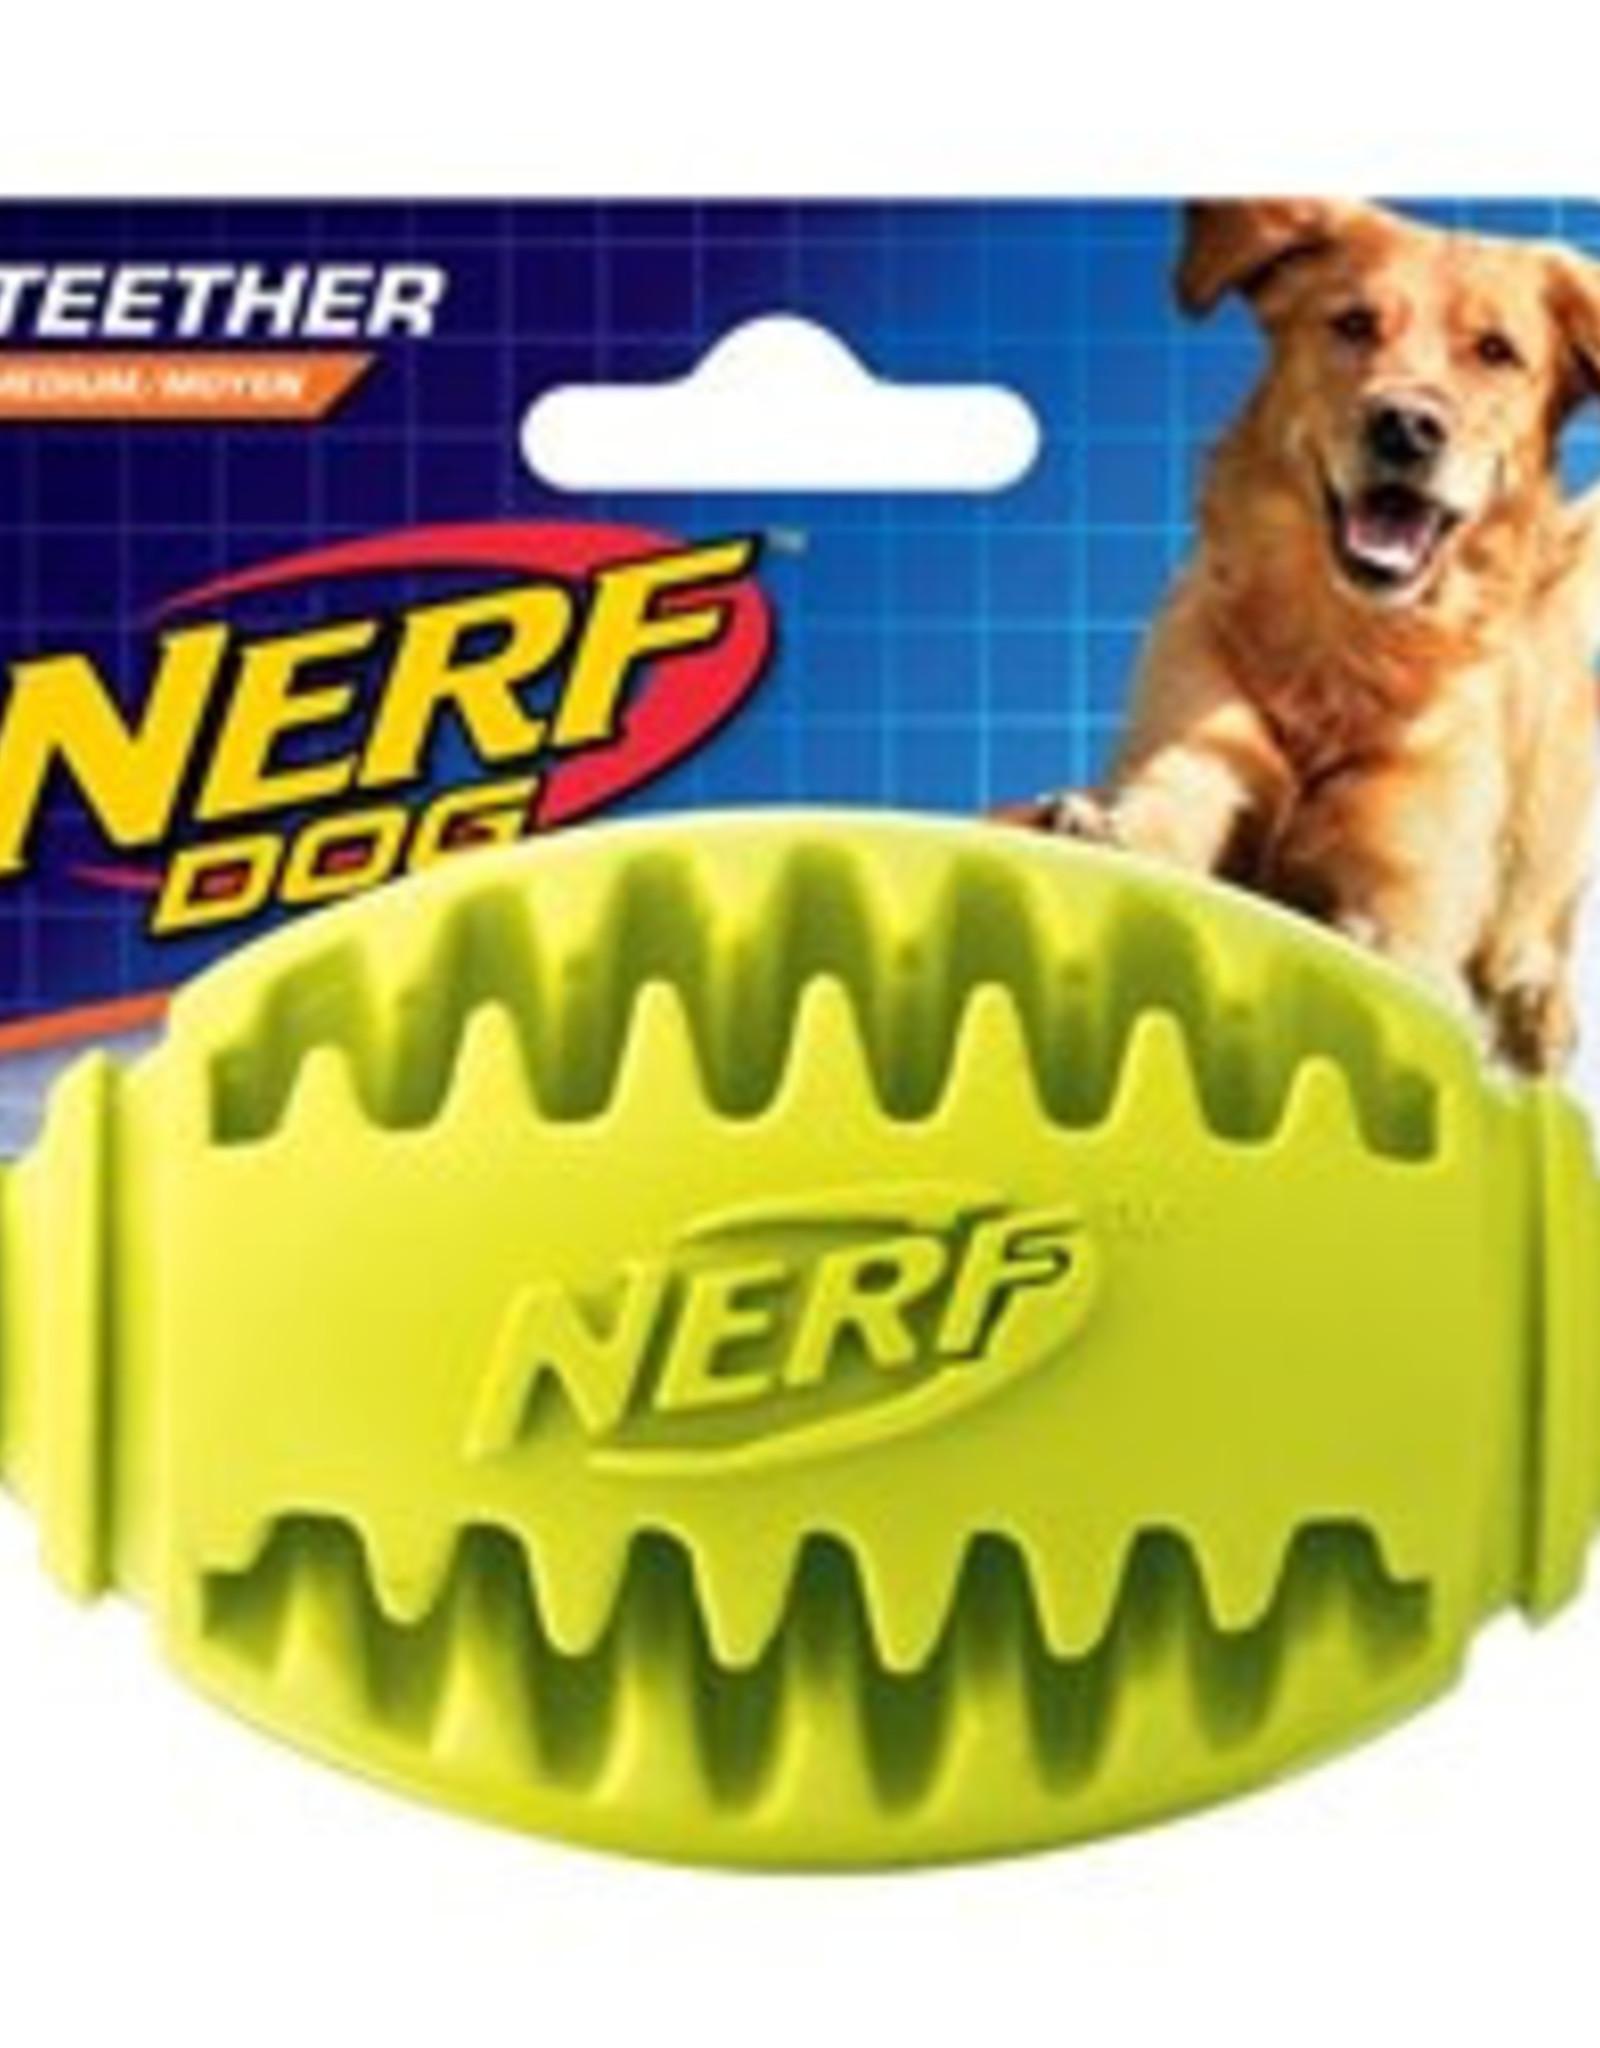 Nerf Dog Teether Football Medium Toy